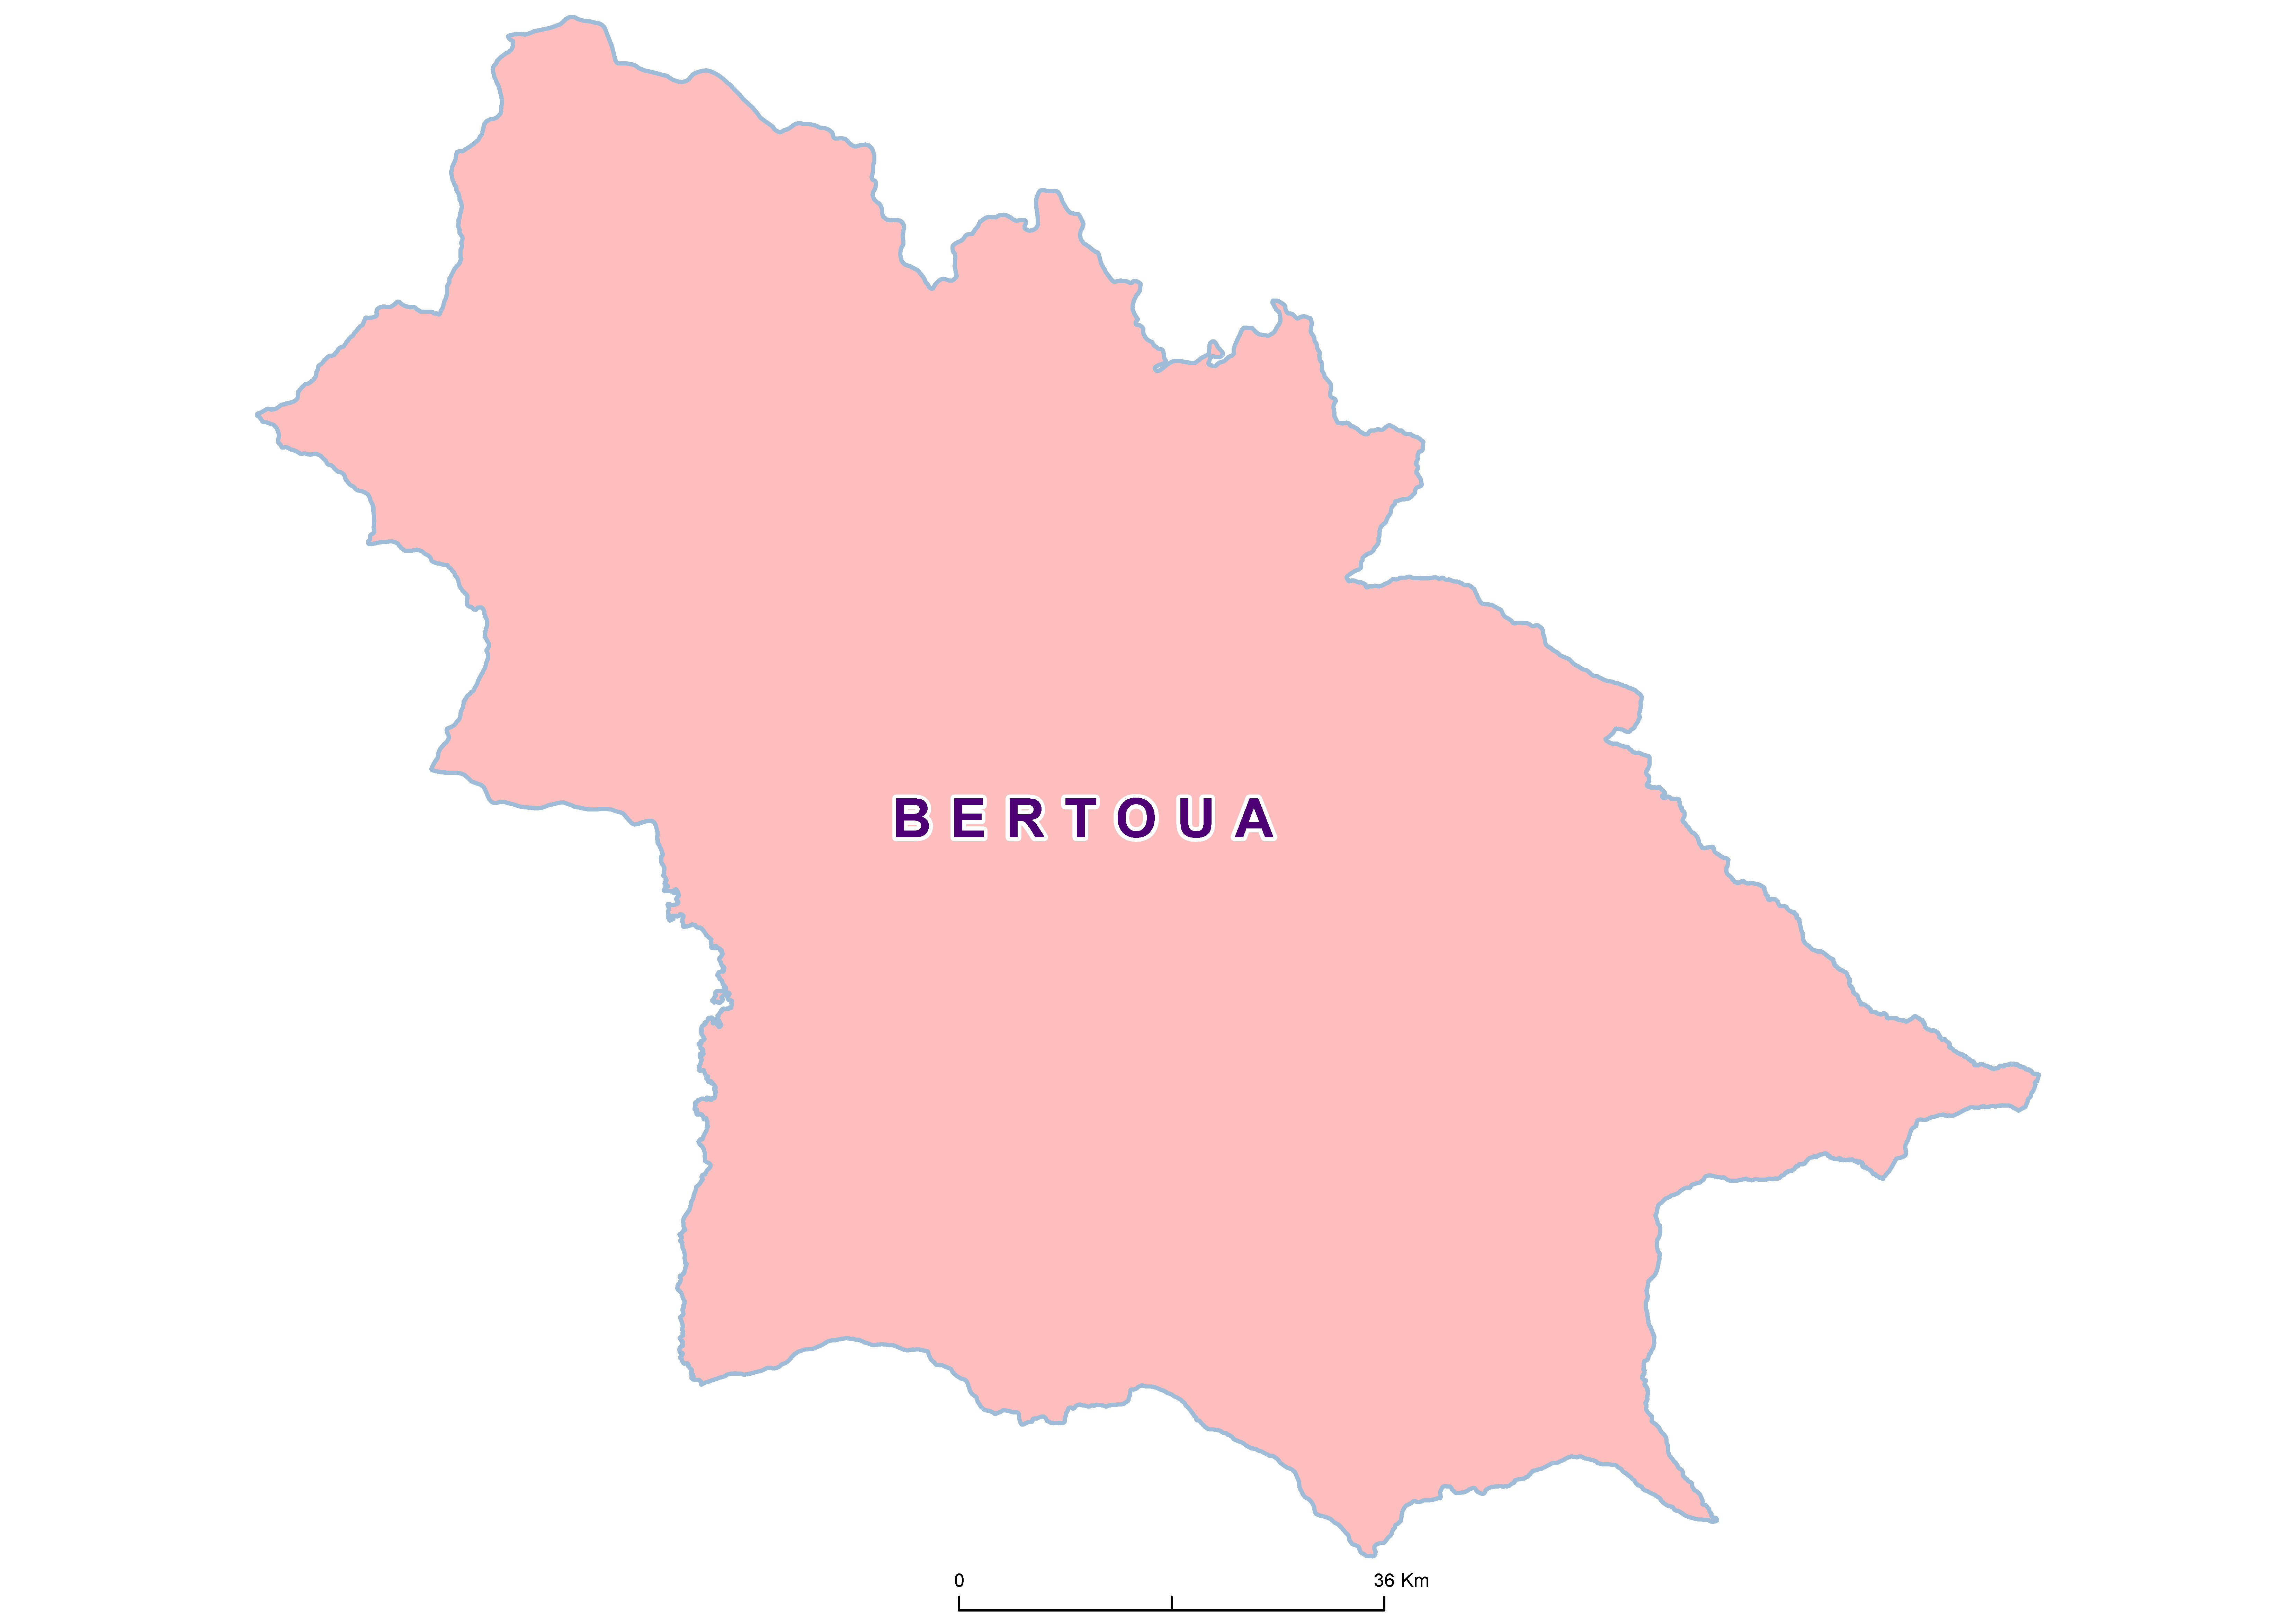 Bertoua Mean SCH 20180001